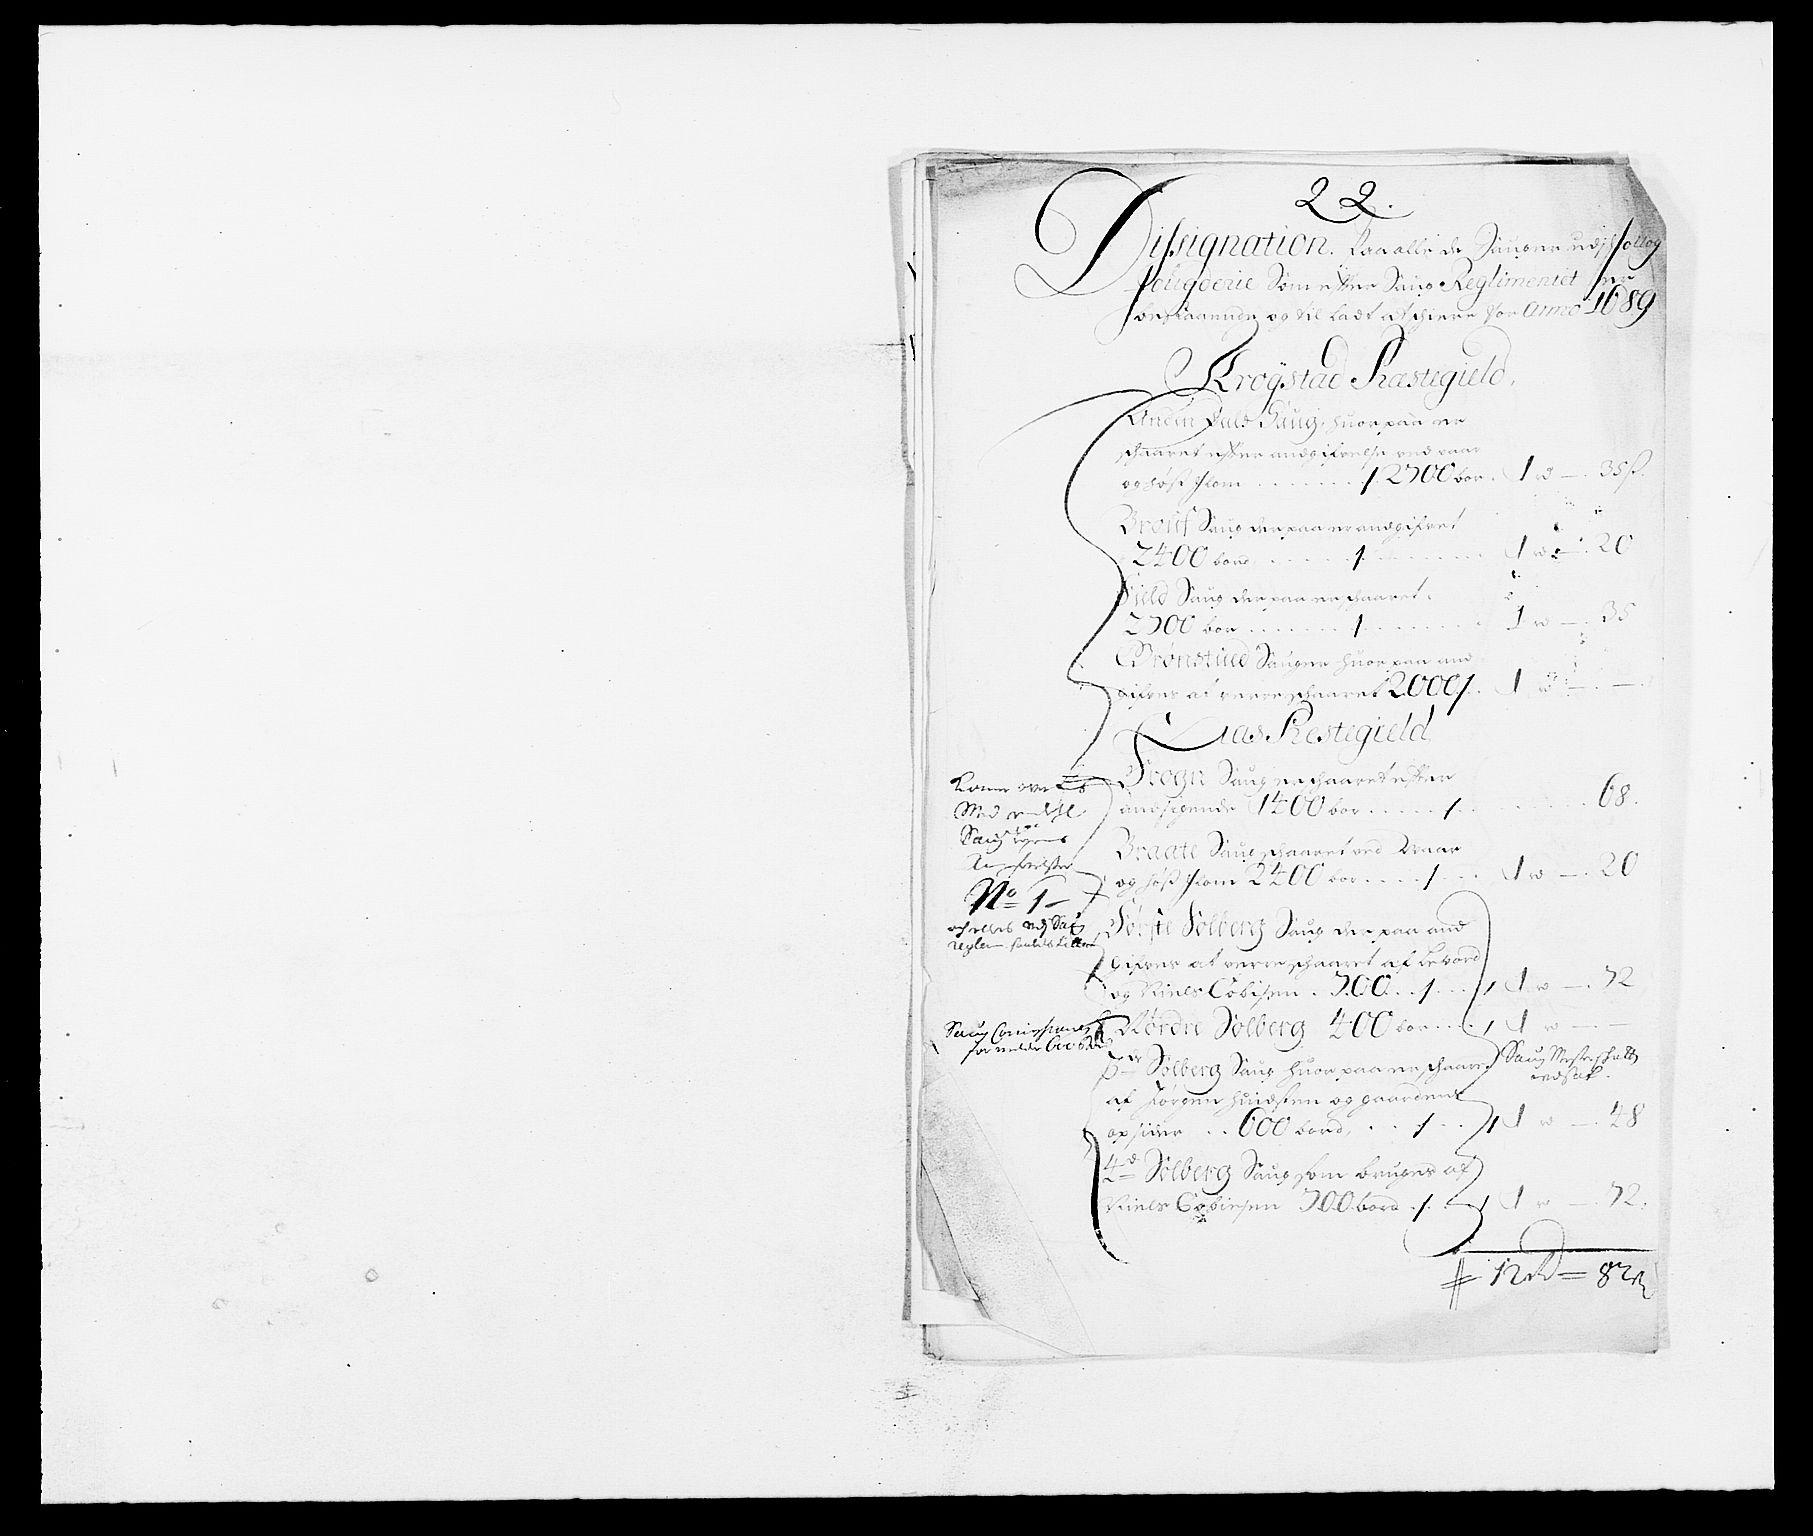 RA, Rentekammeret inntil 1814, Reviderte regnskaper, Fogderegnskap, R09/L0435: Fogderegnskap Follo, 1689-1691, s. 167